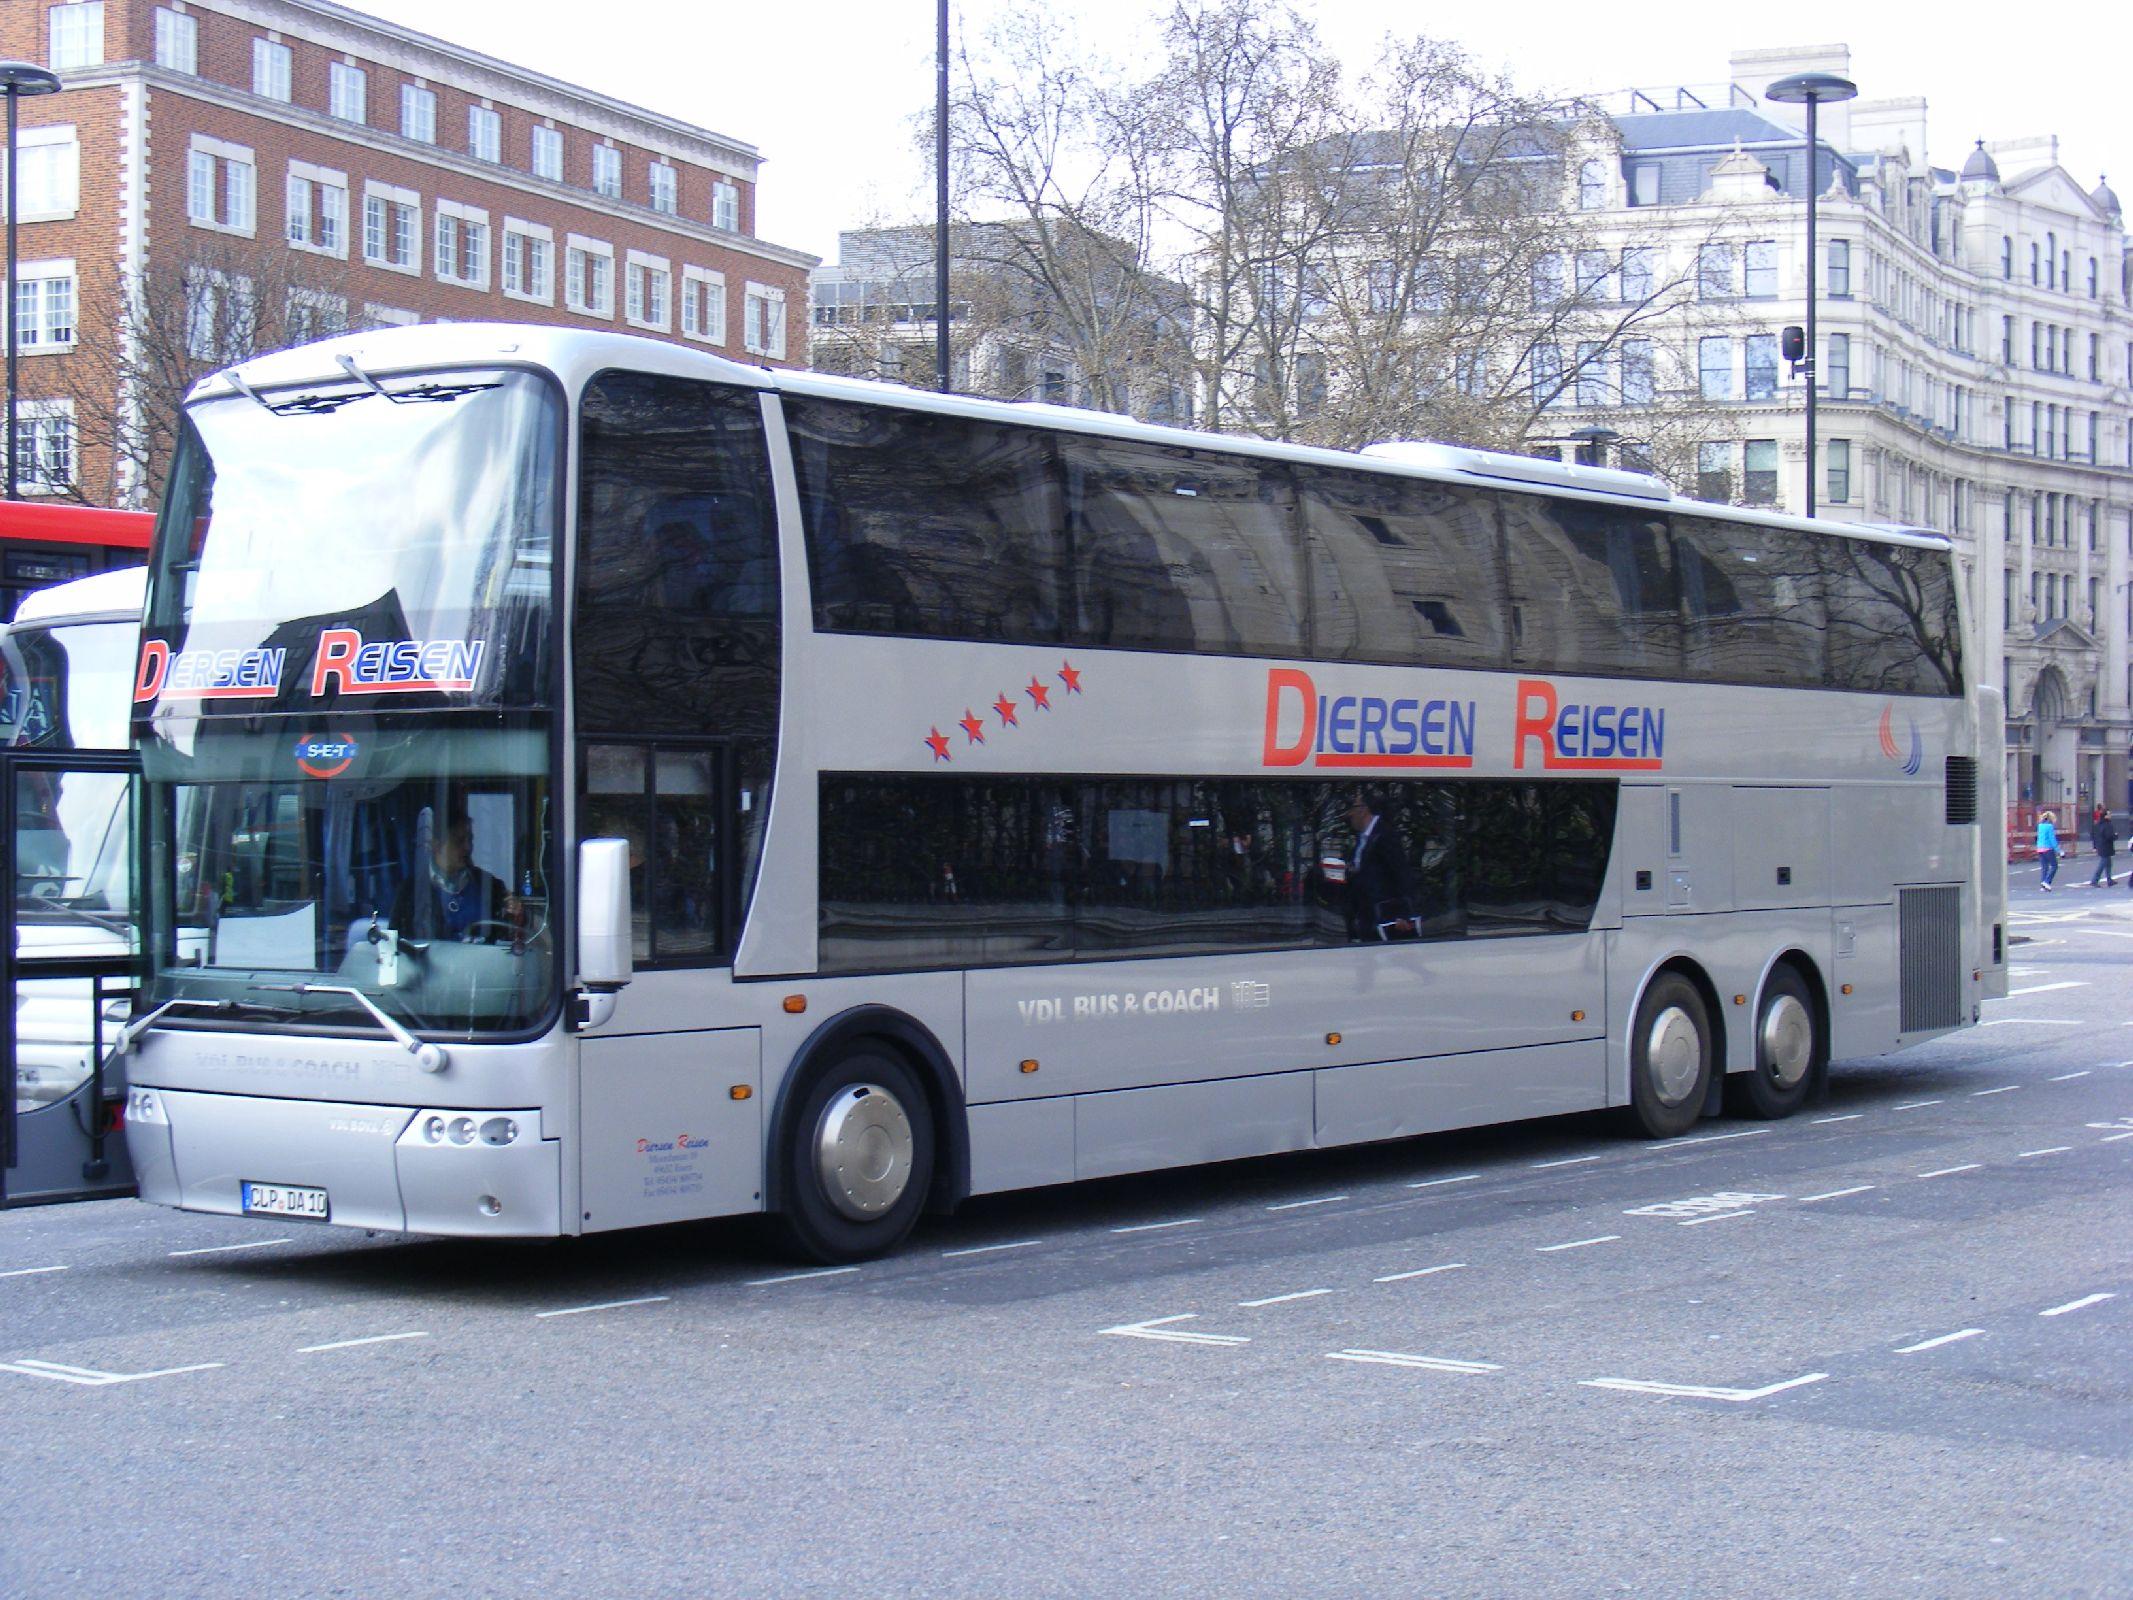 file clp da 10 diersen reisen bova essen oldenburg london april 2010 flickr. Black Bedroom Furniture Sets. Home Design Ideas